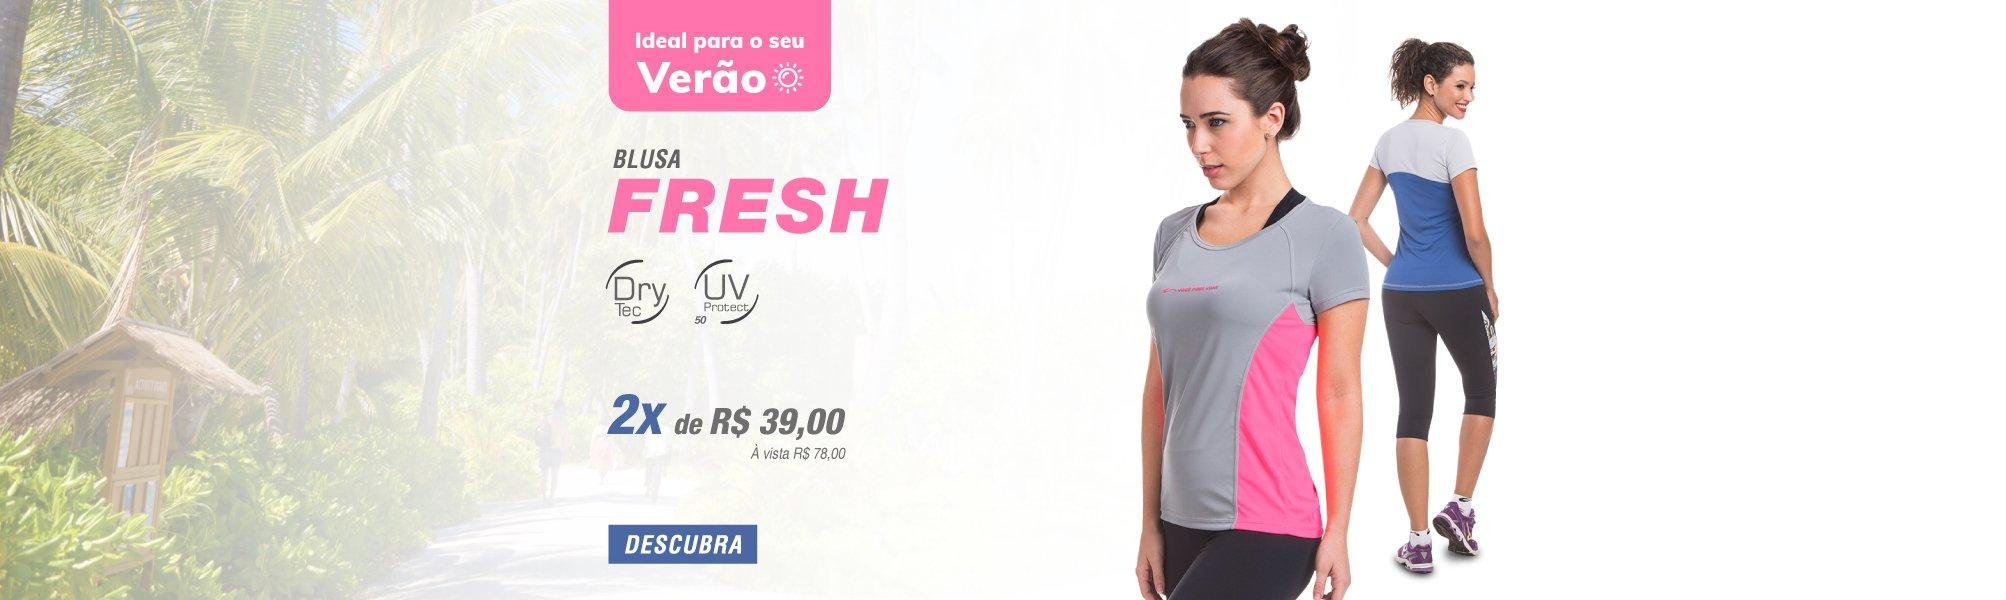 Blusa Fresh